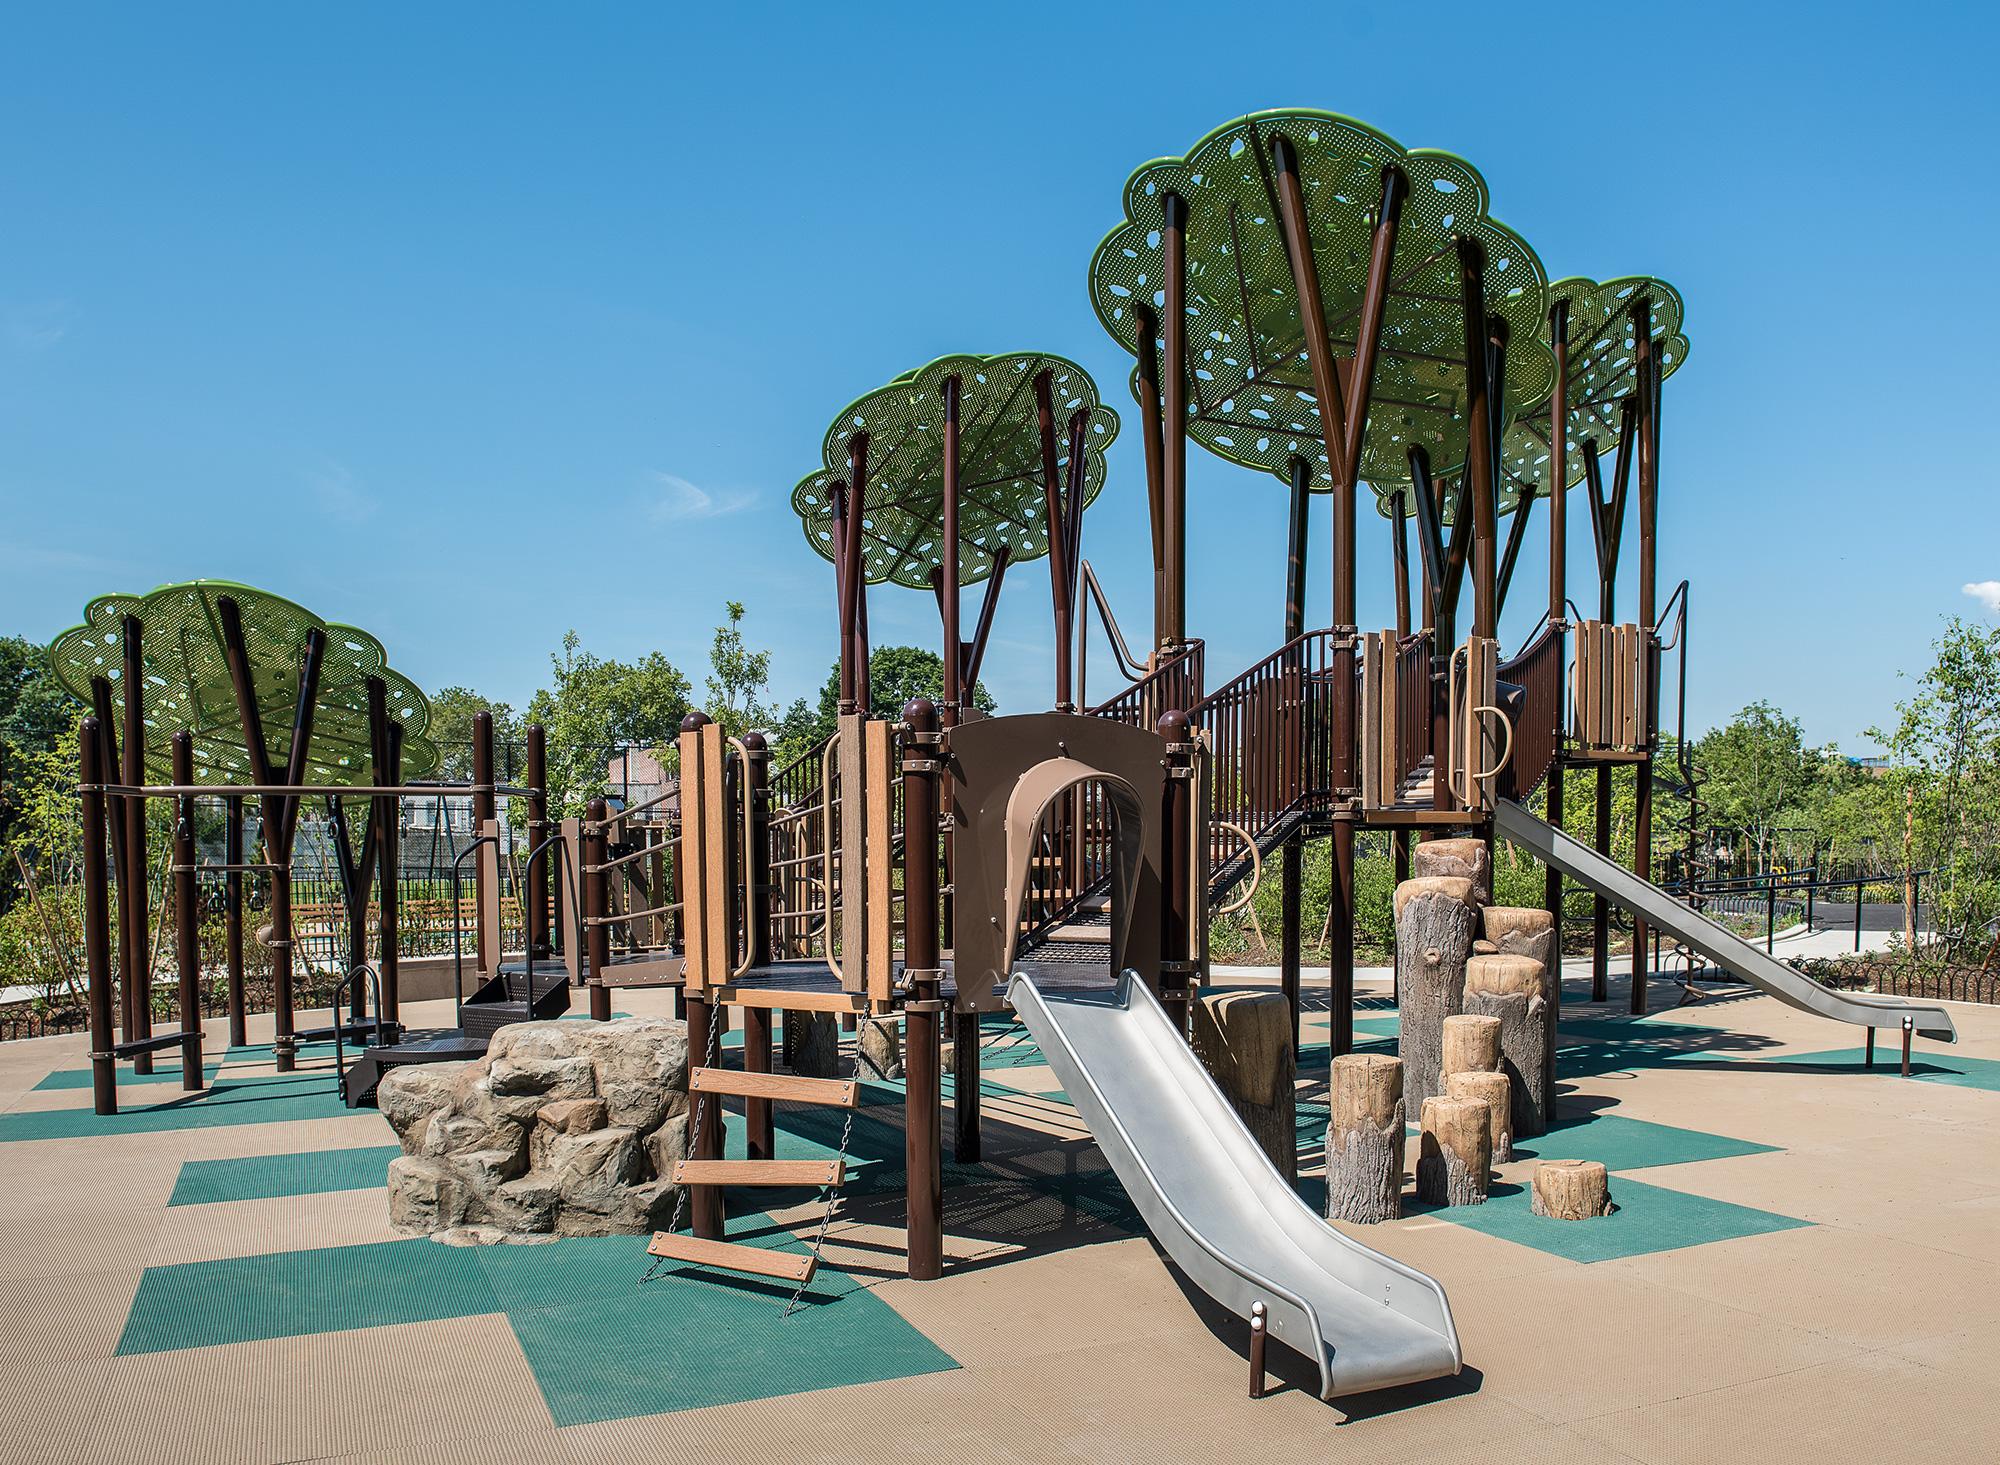 Nature Inspired Playgrounds